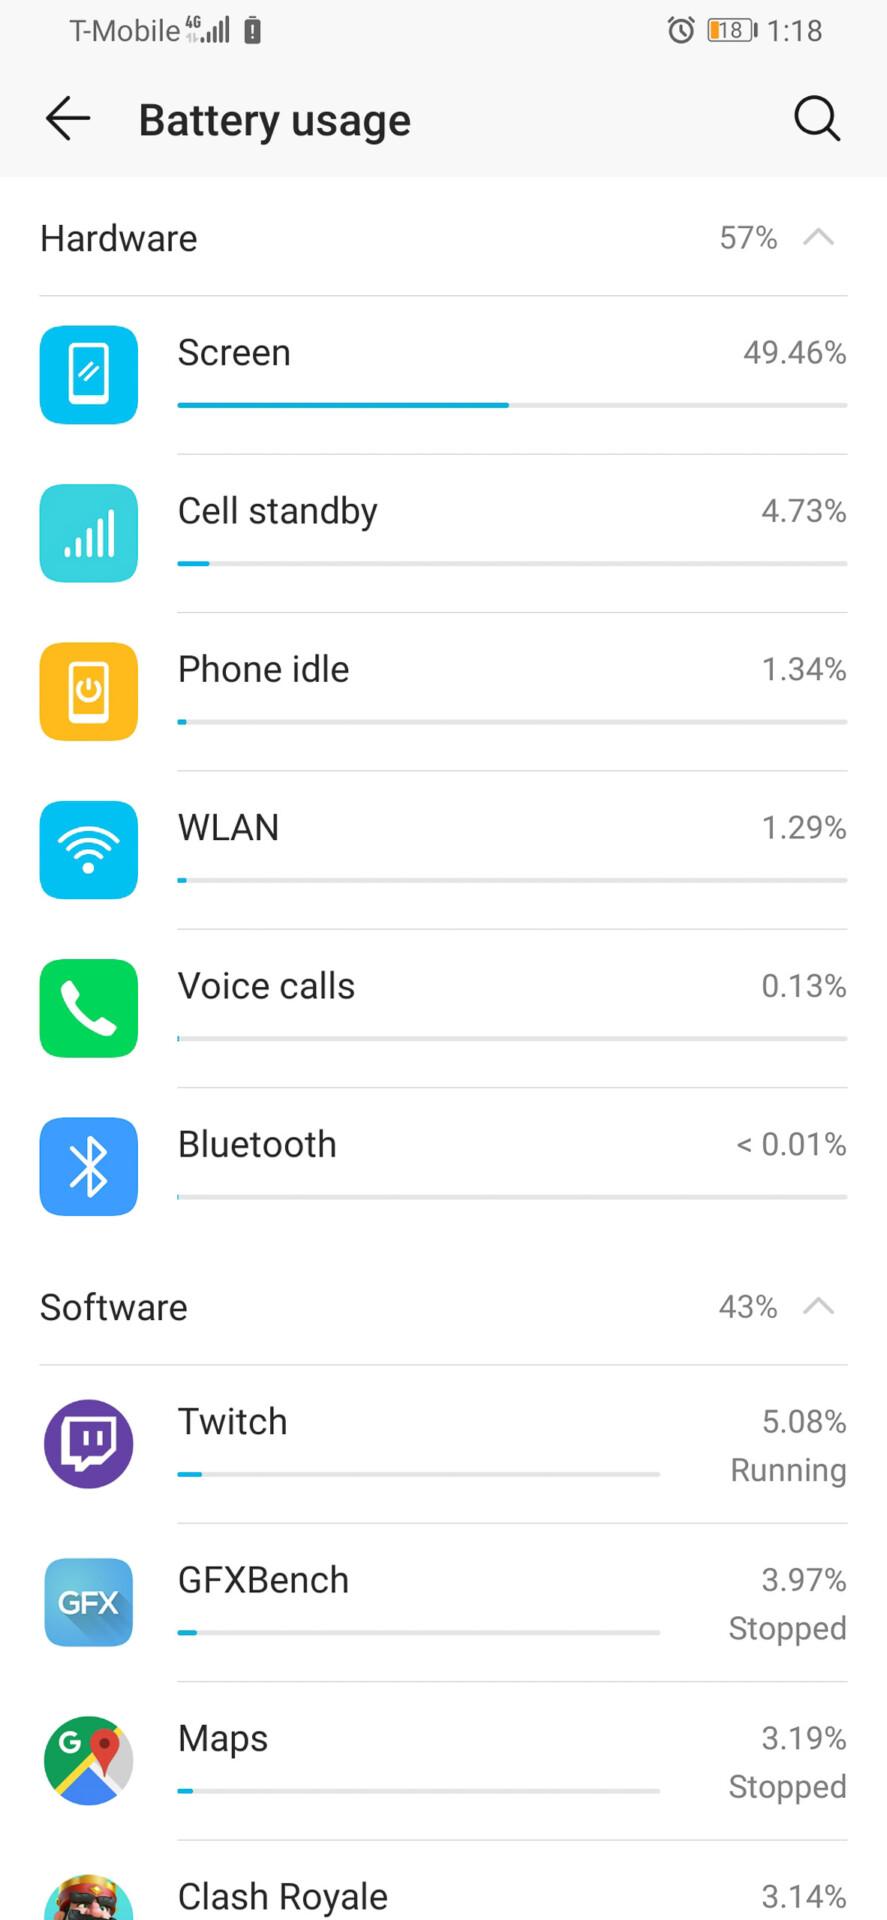 Screenshot of the Honor Magic 2 battery usage